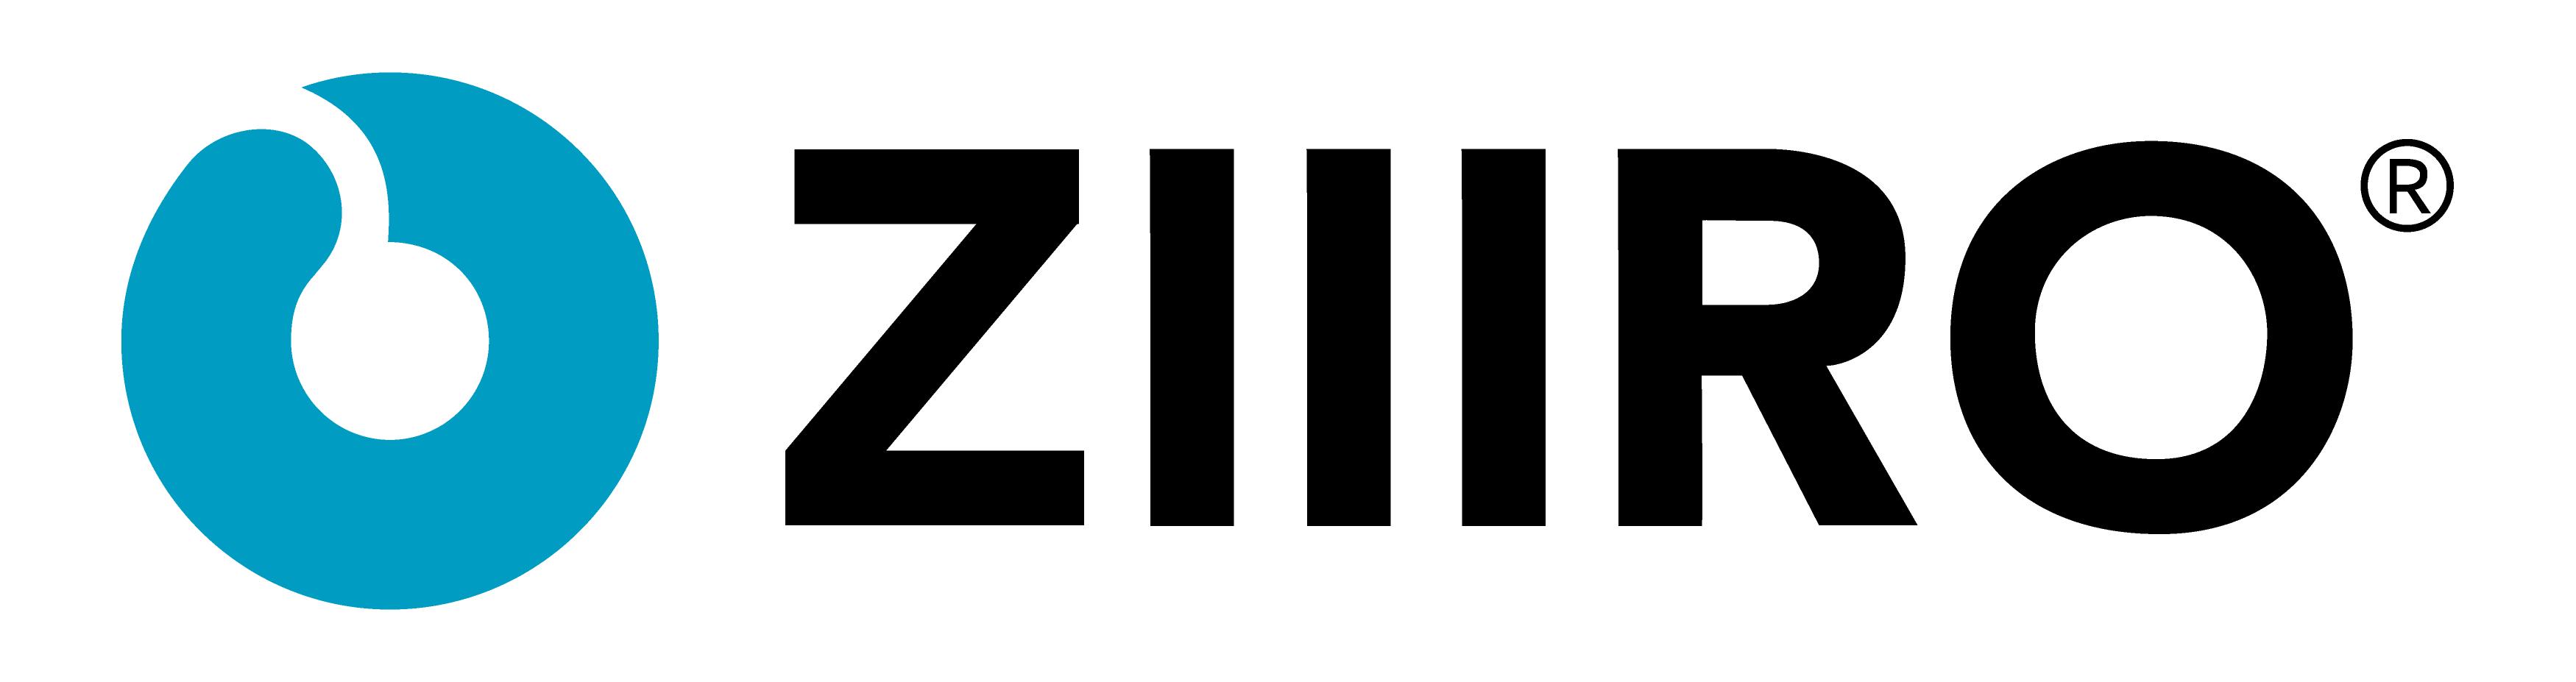 ZIIIRO(ジーロ) 公式 オンラインストア